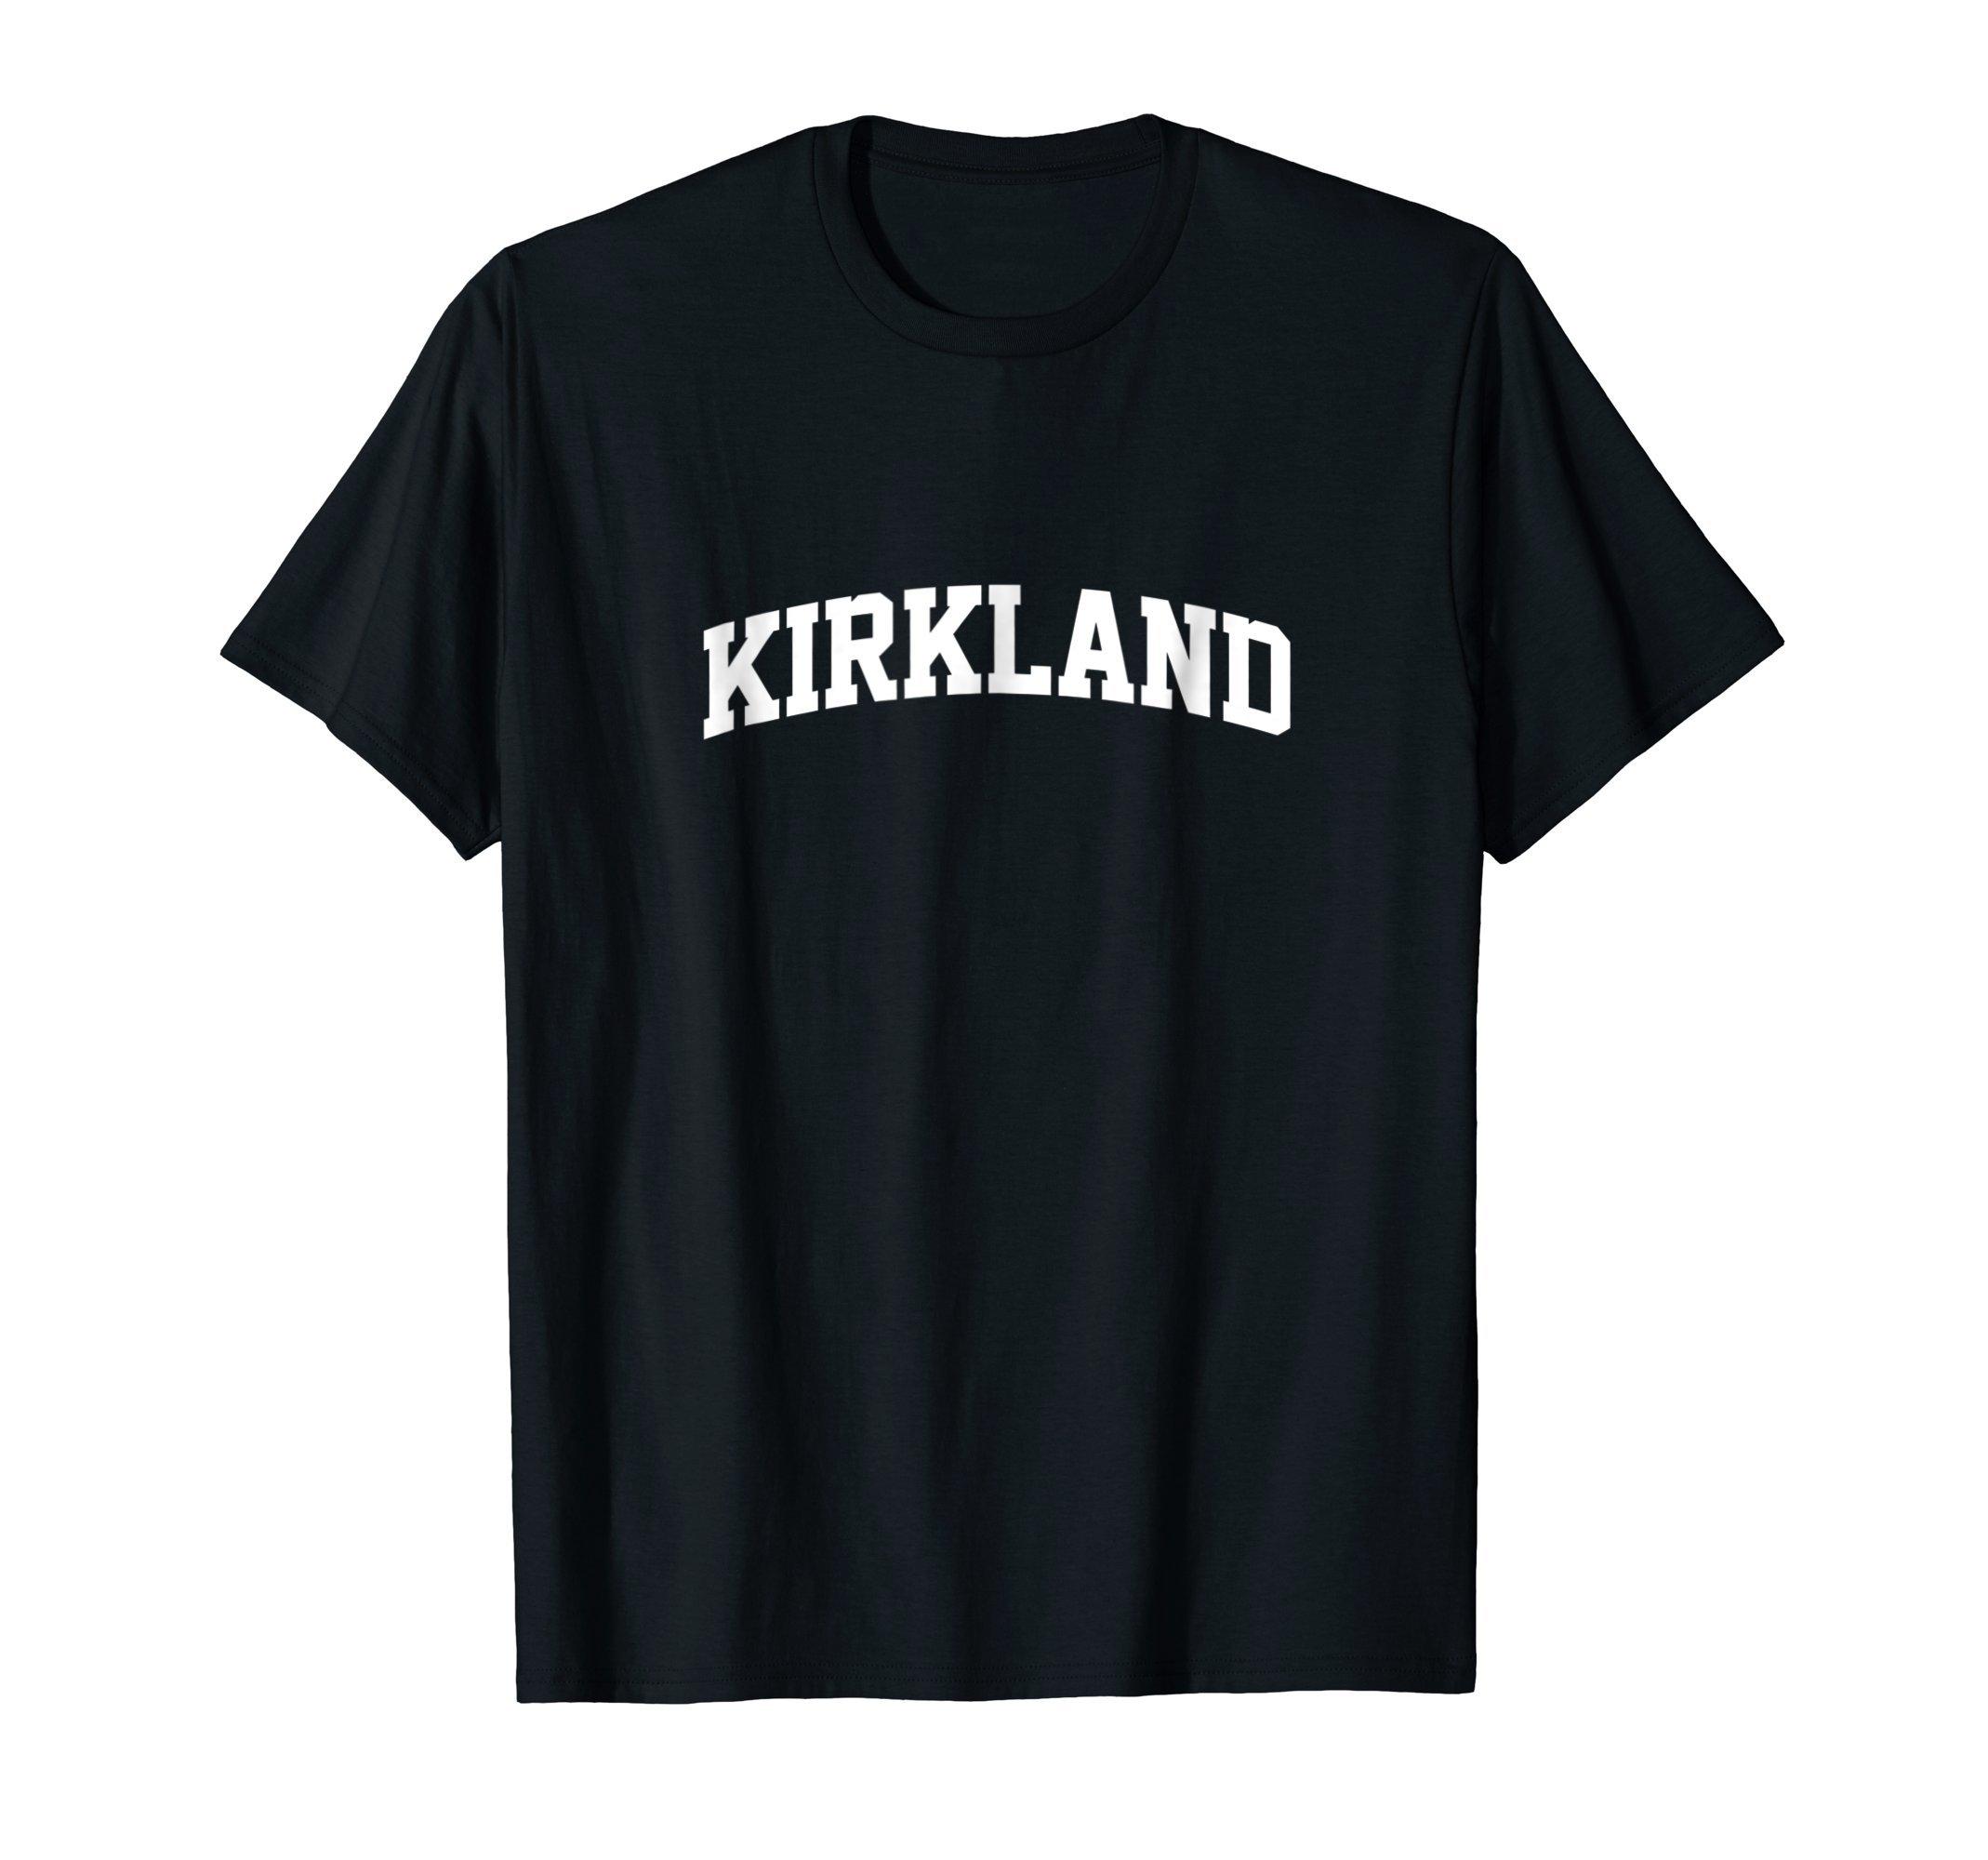 Kirkland Family Name Kirkland T-Shirt